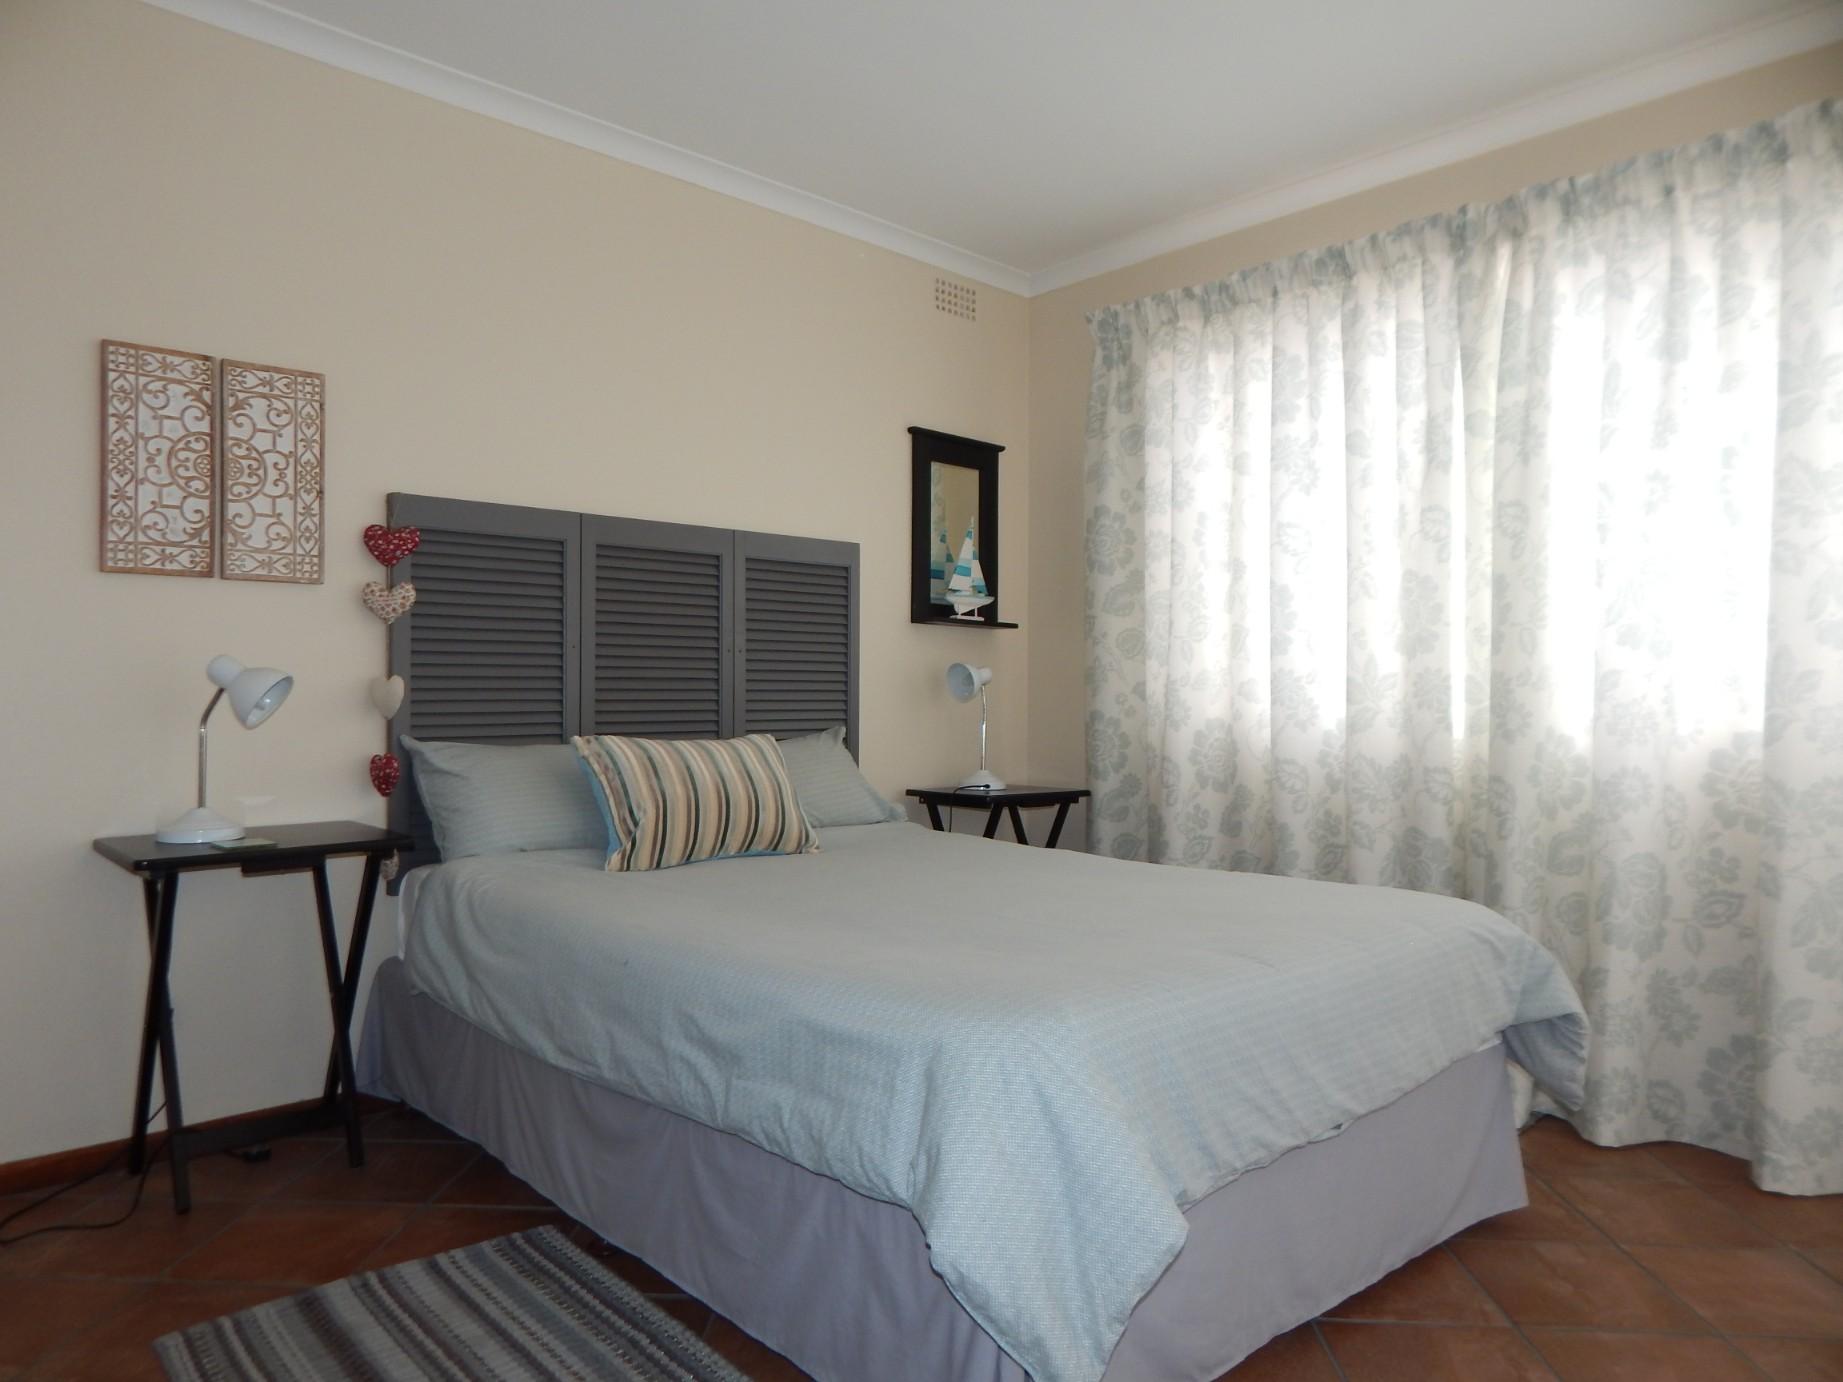 3 Bedroom Apartment for sale in De Bakke ENT0066483 : photo#14